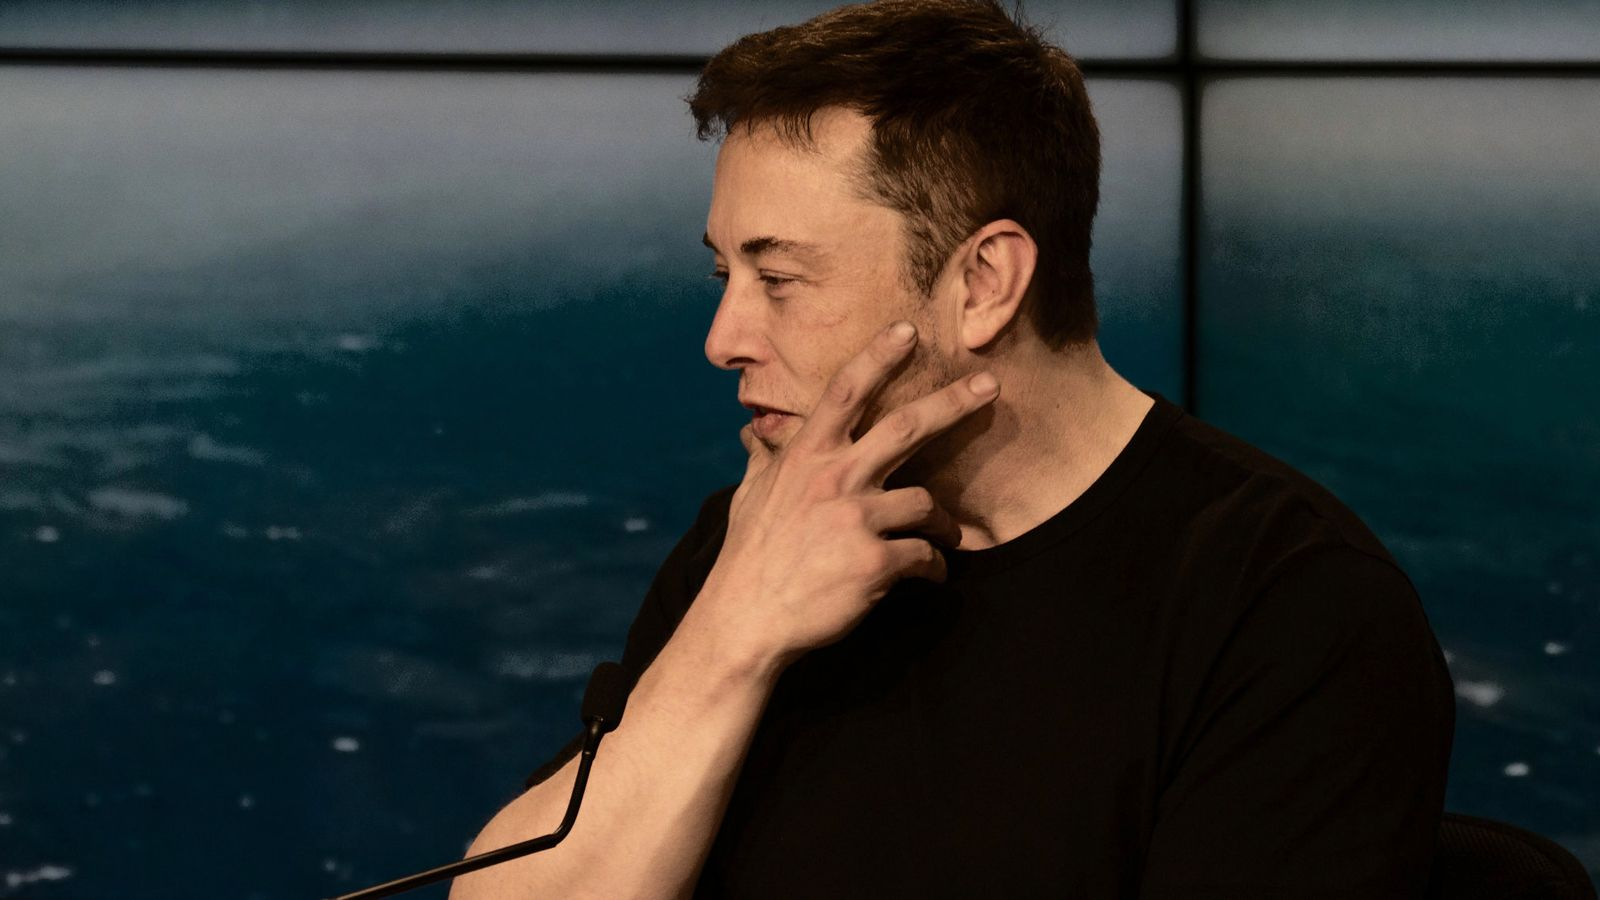 Elon Musk's wild new promise